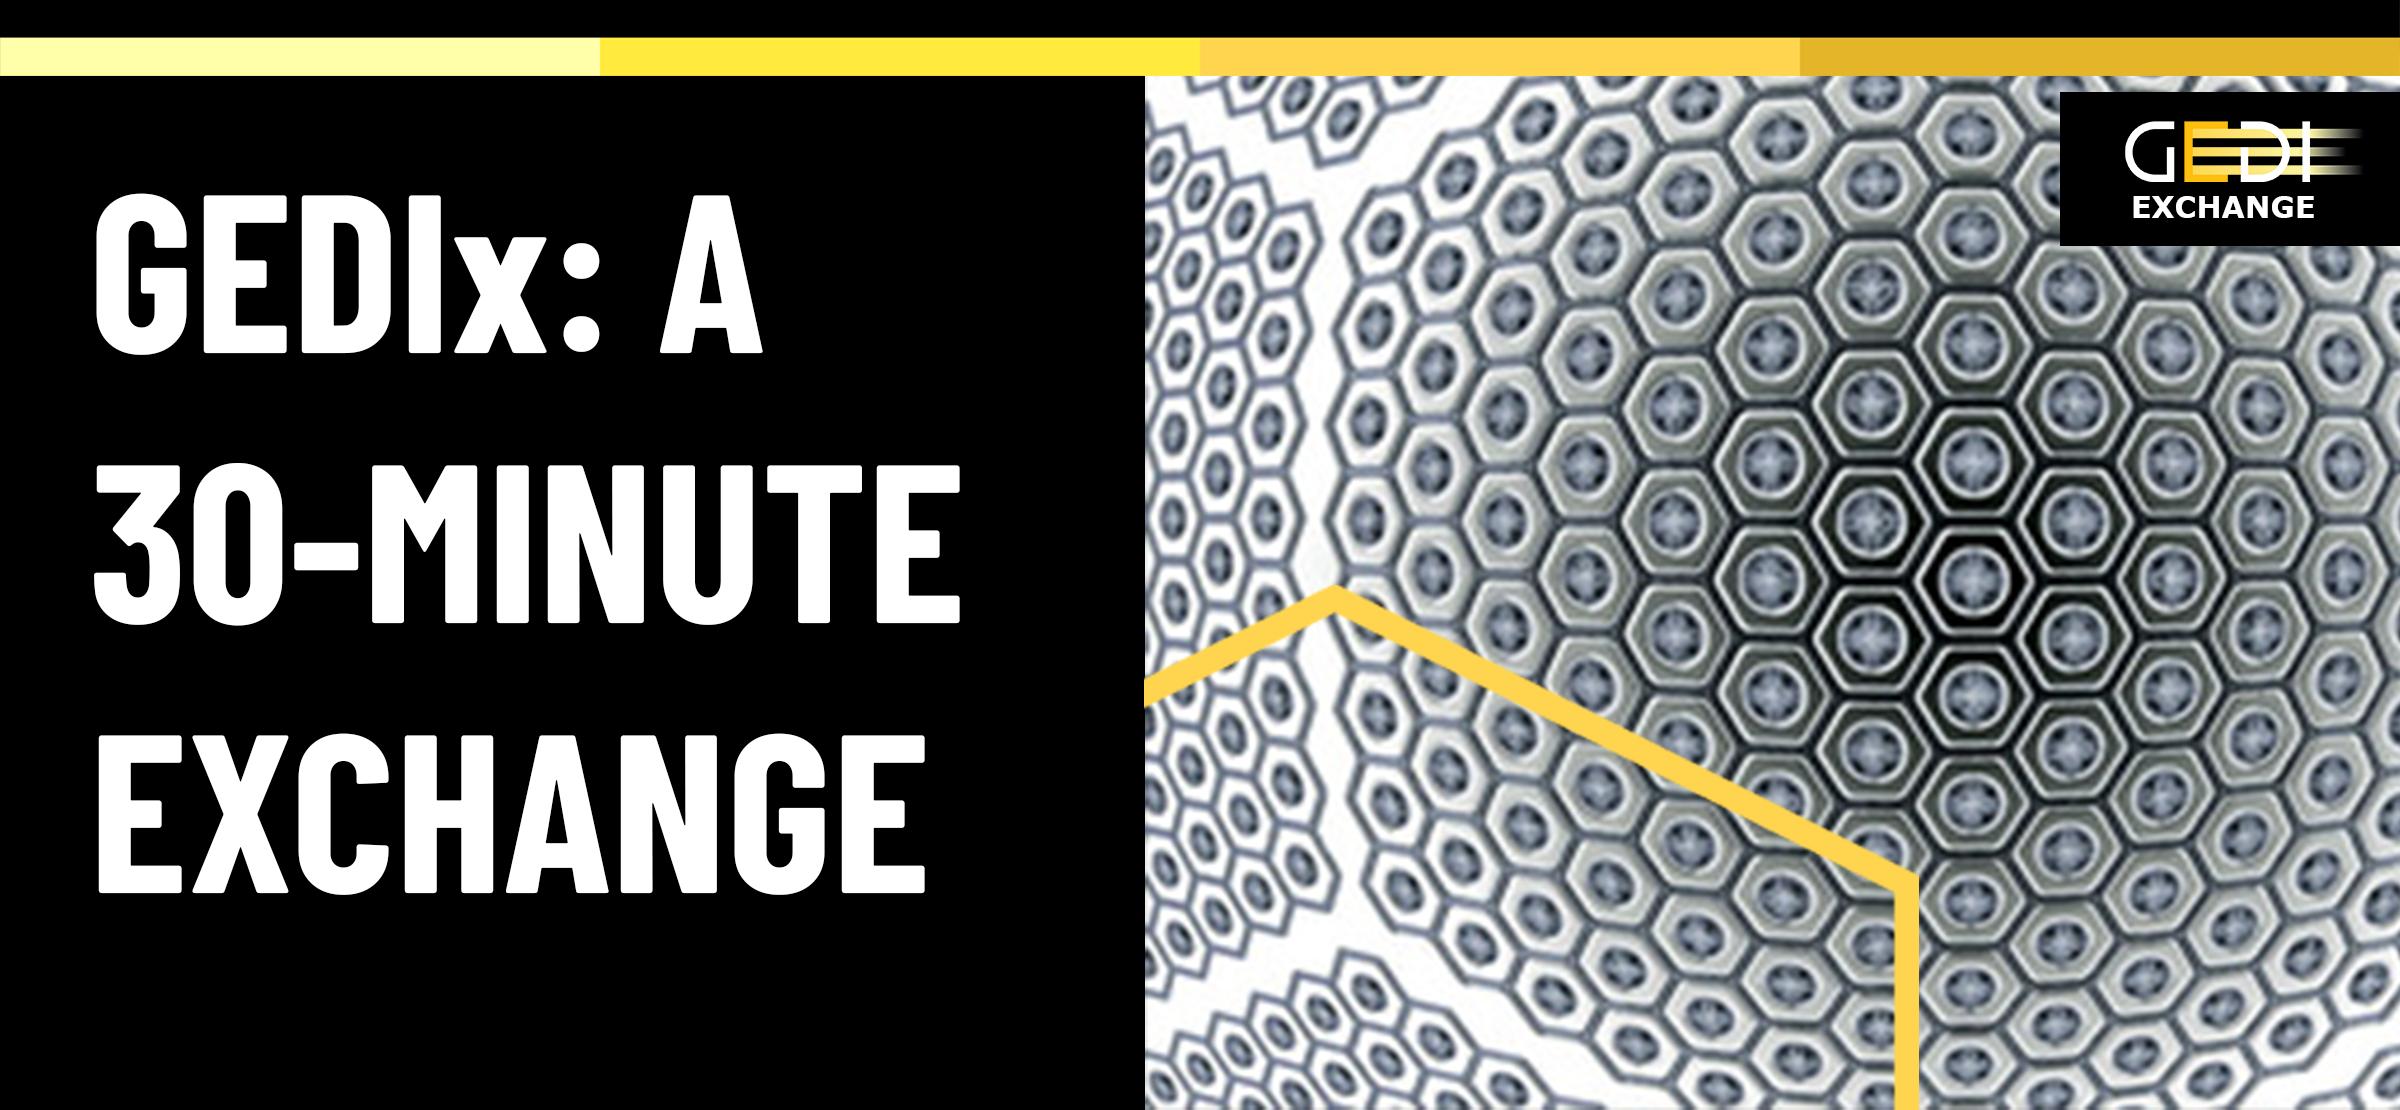 GEDIx: A 30-Minute Exchange